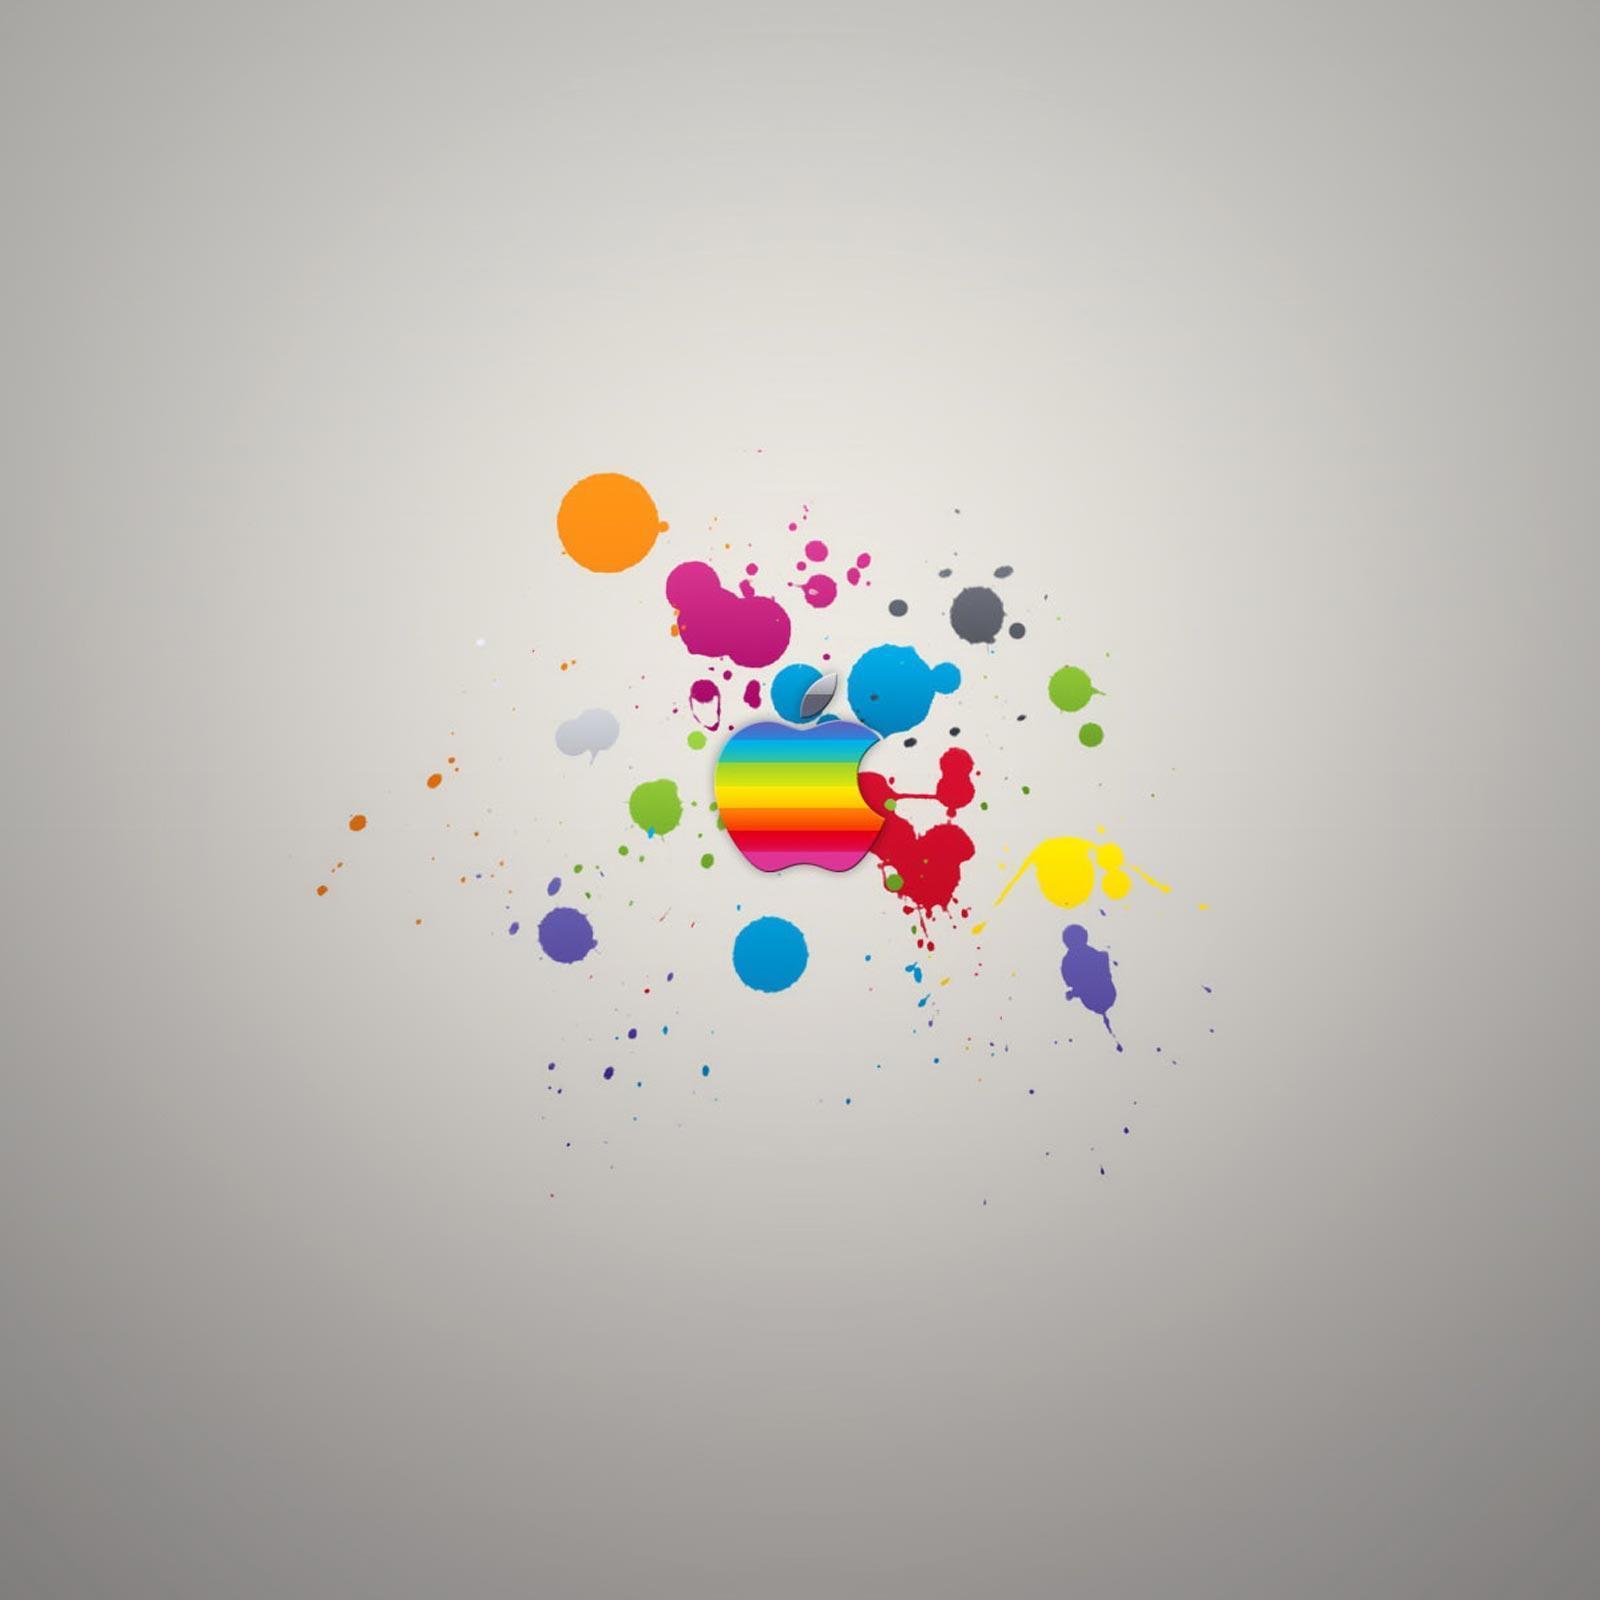 Ramilre3 avatar